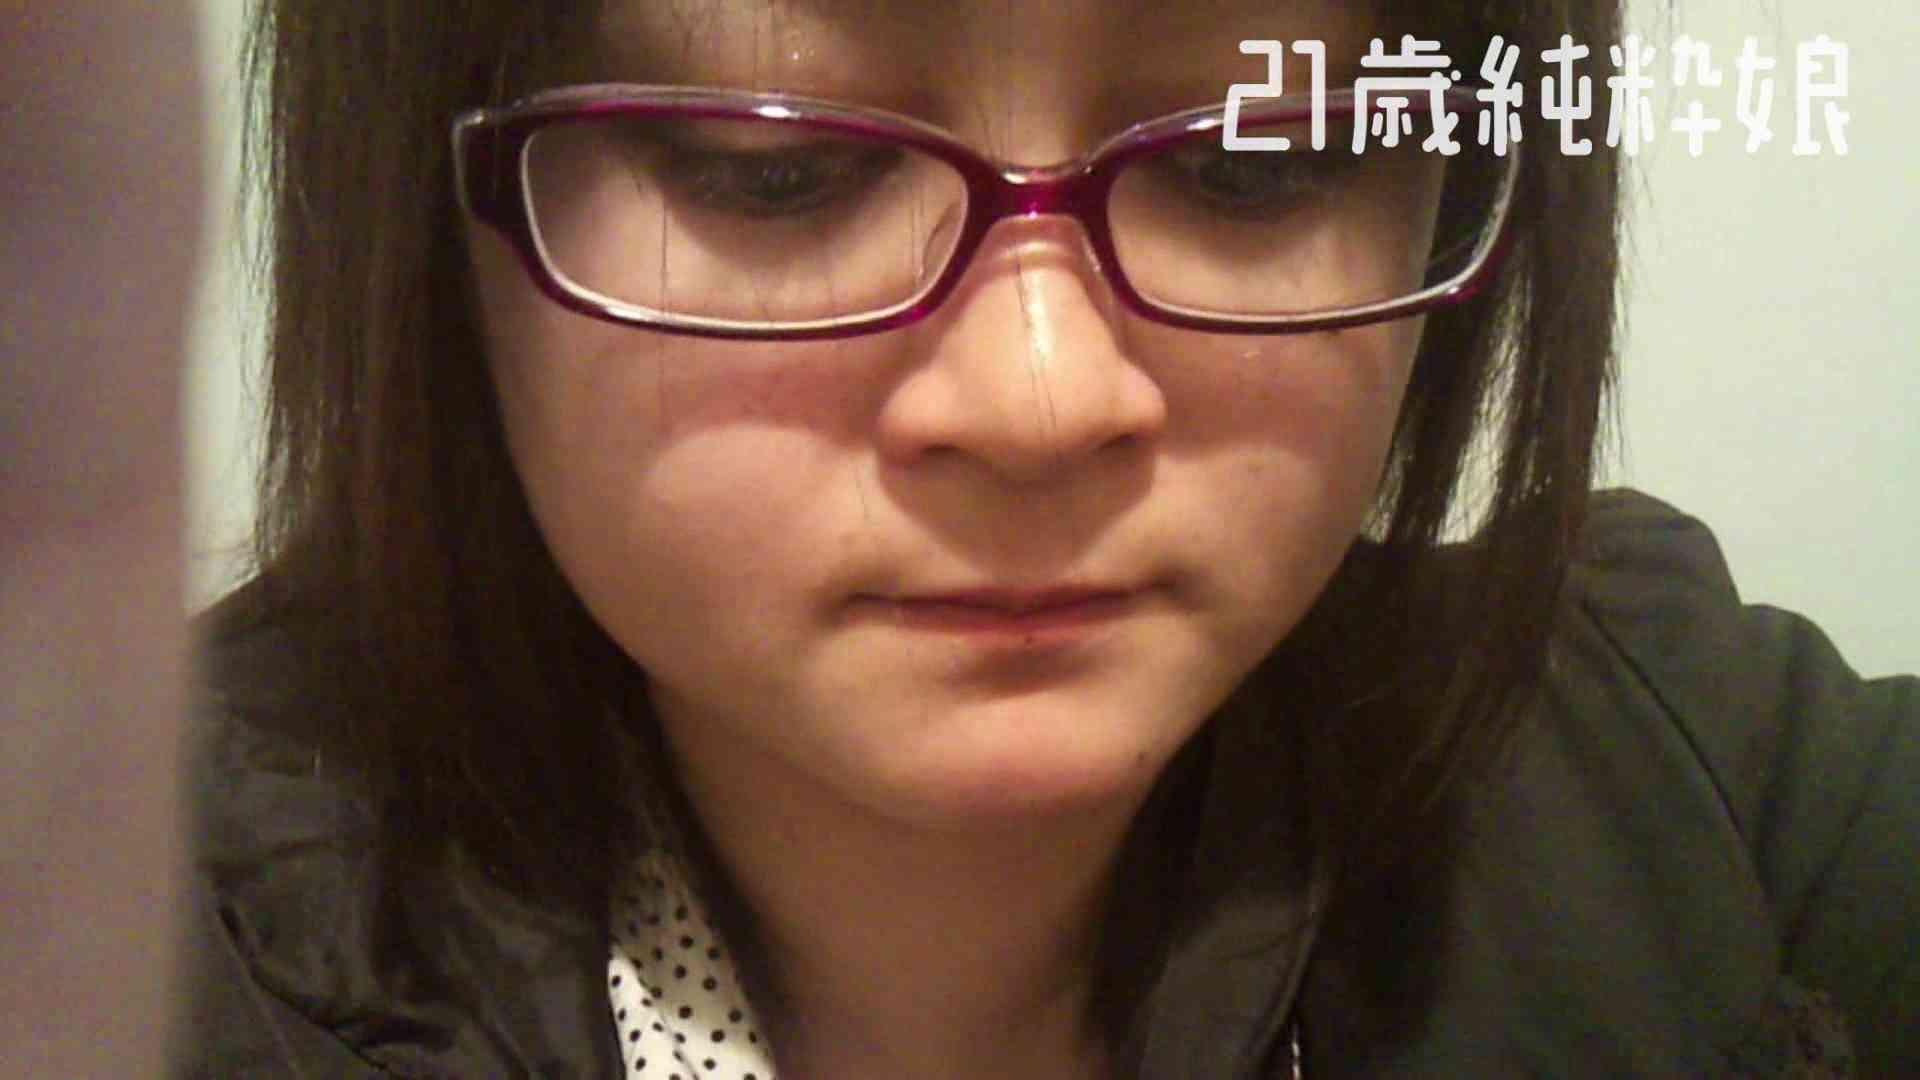 Gカップ21歳純粋嬢第2弾Vol.5 性欲丸出し | 学校  101pic 82